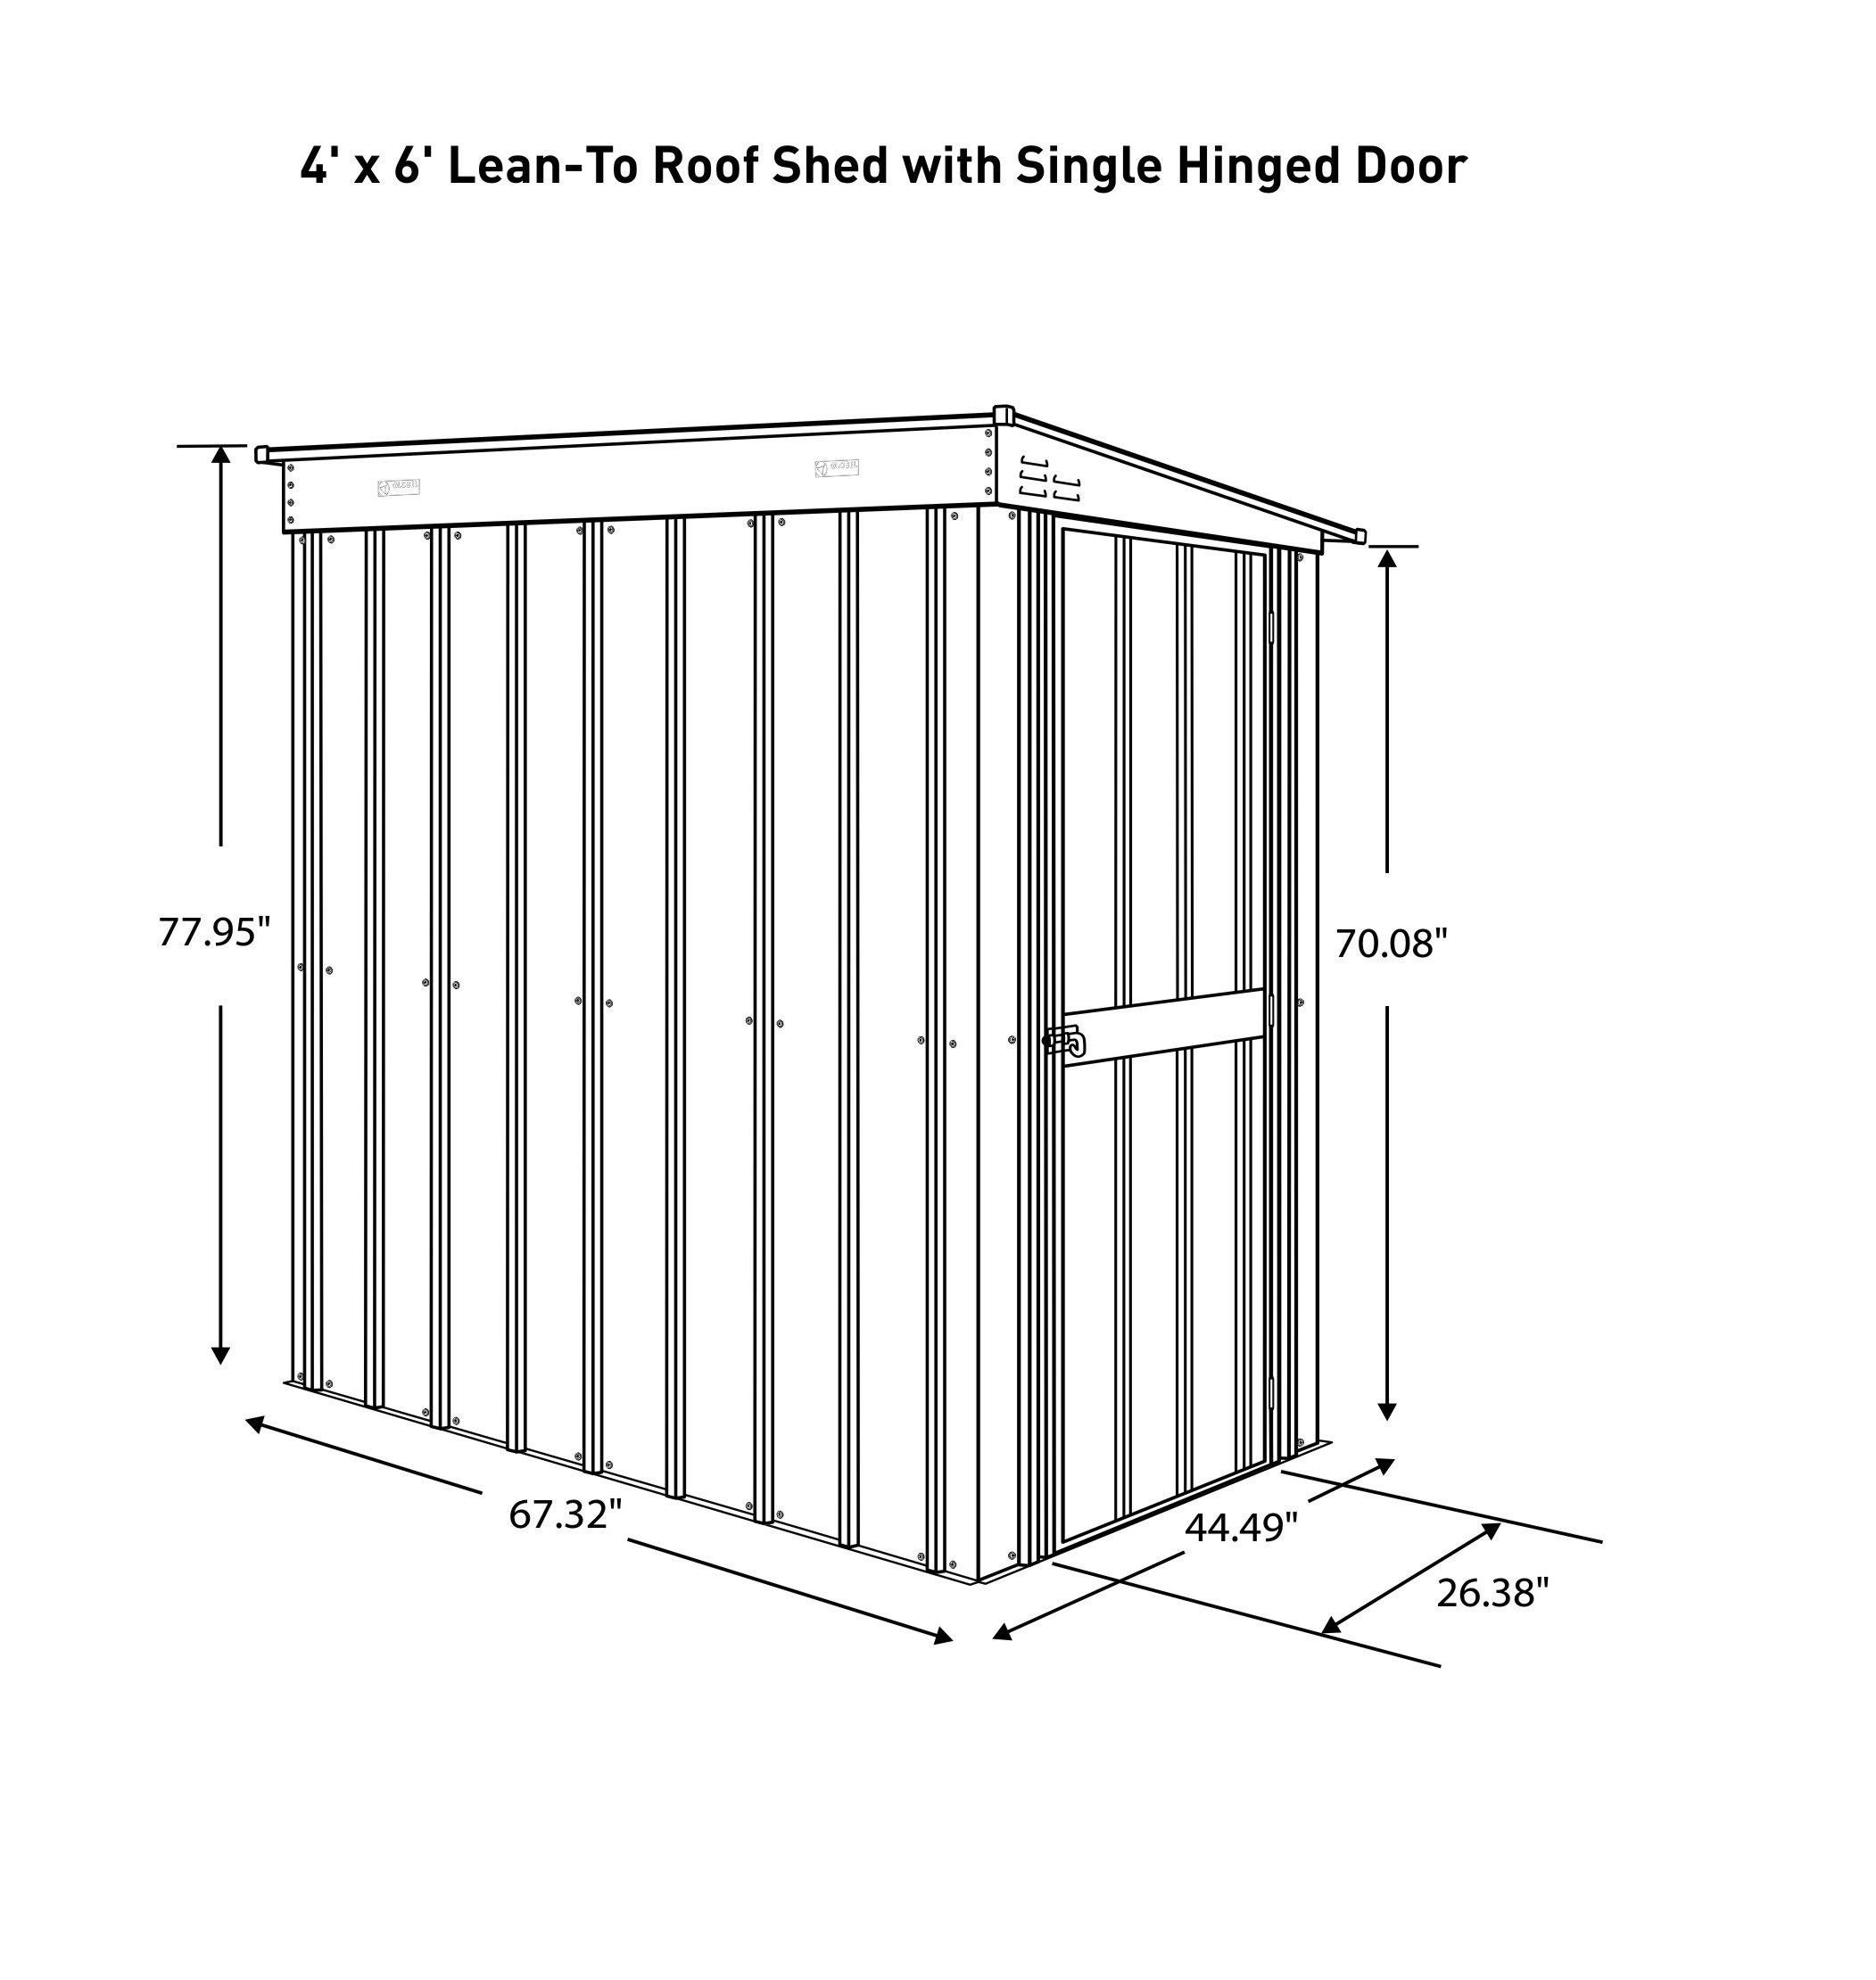 Globel 4x6 Lean-To Steel Storage Shed Slate Grey and Aluminum White by Globel (Image #4)